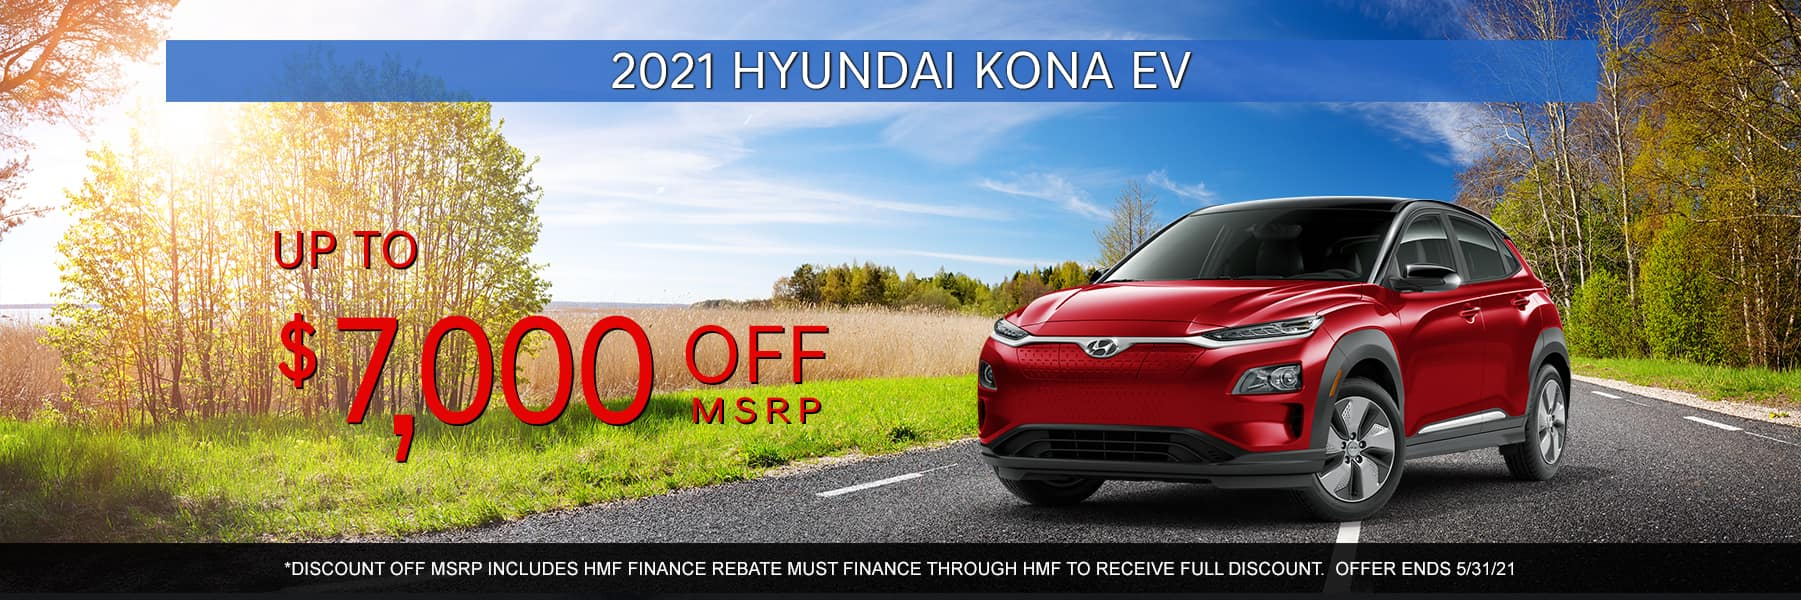 2021-Hyundai-Kona-EV-May21